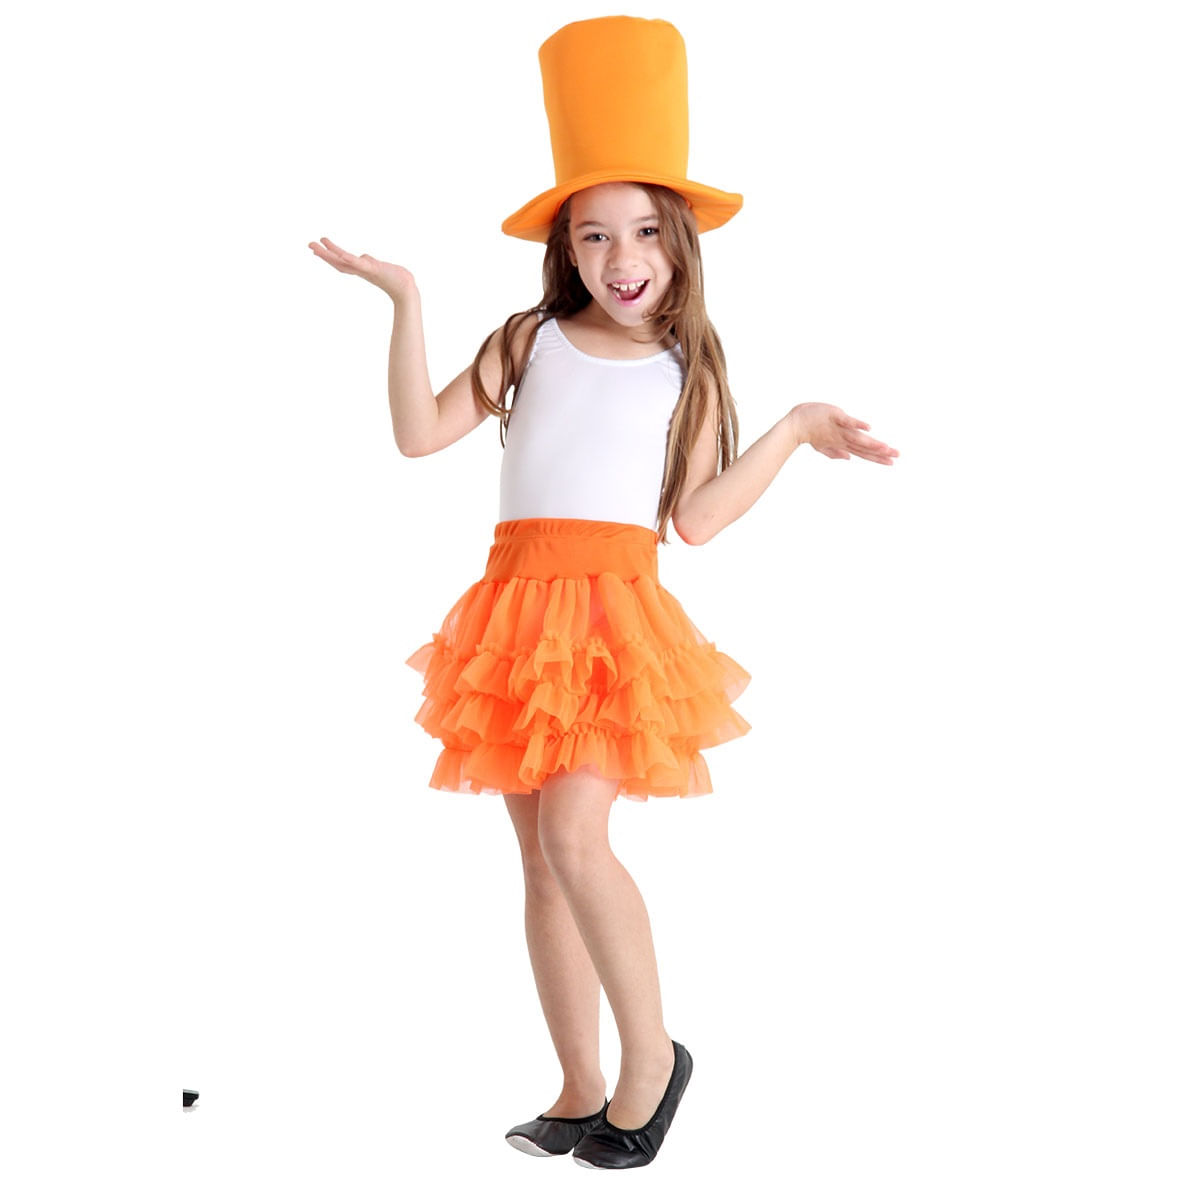 Fantasia Make Your Own - Saia Tutu Laranja Infantil M